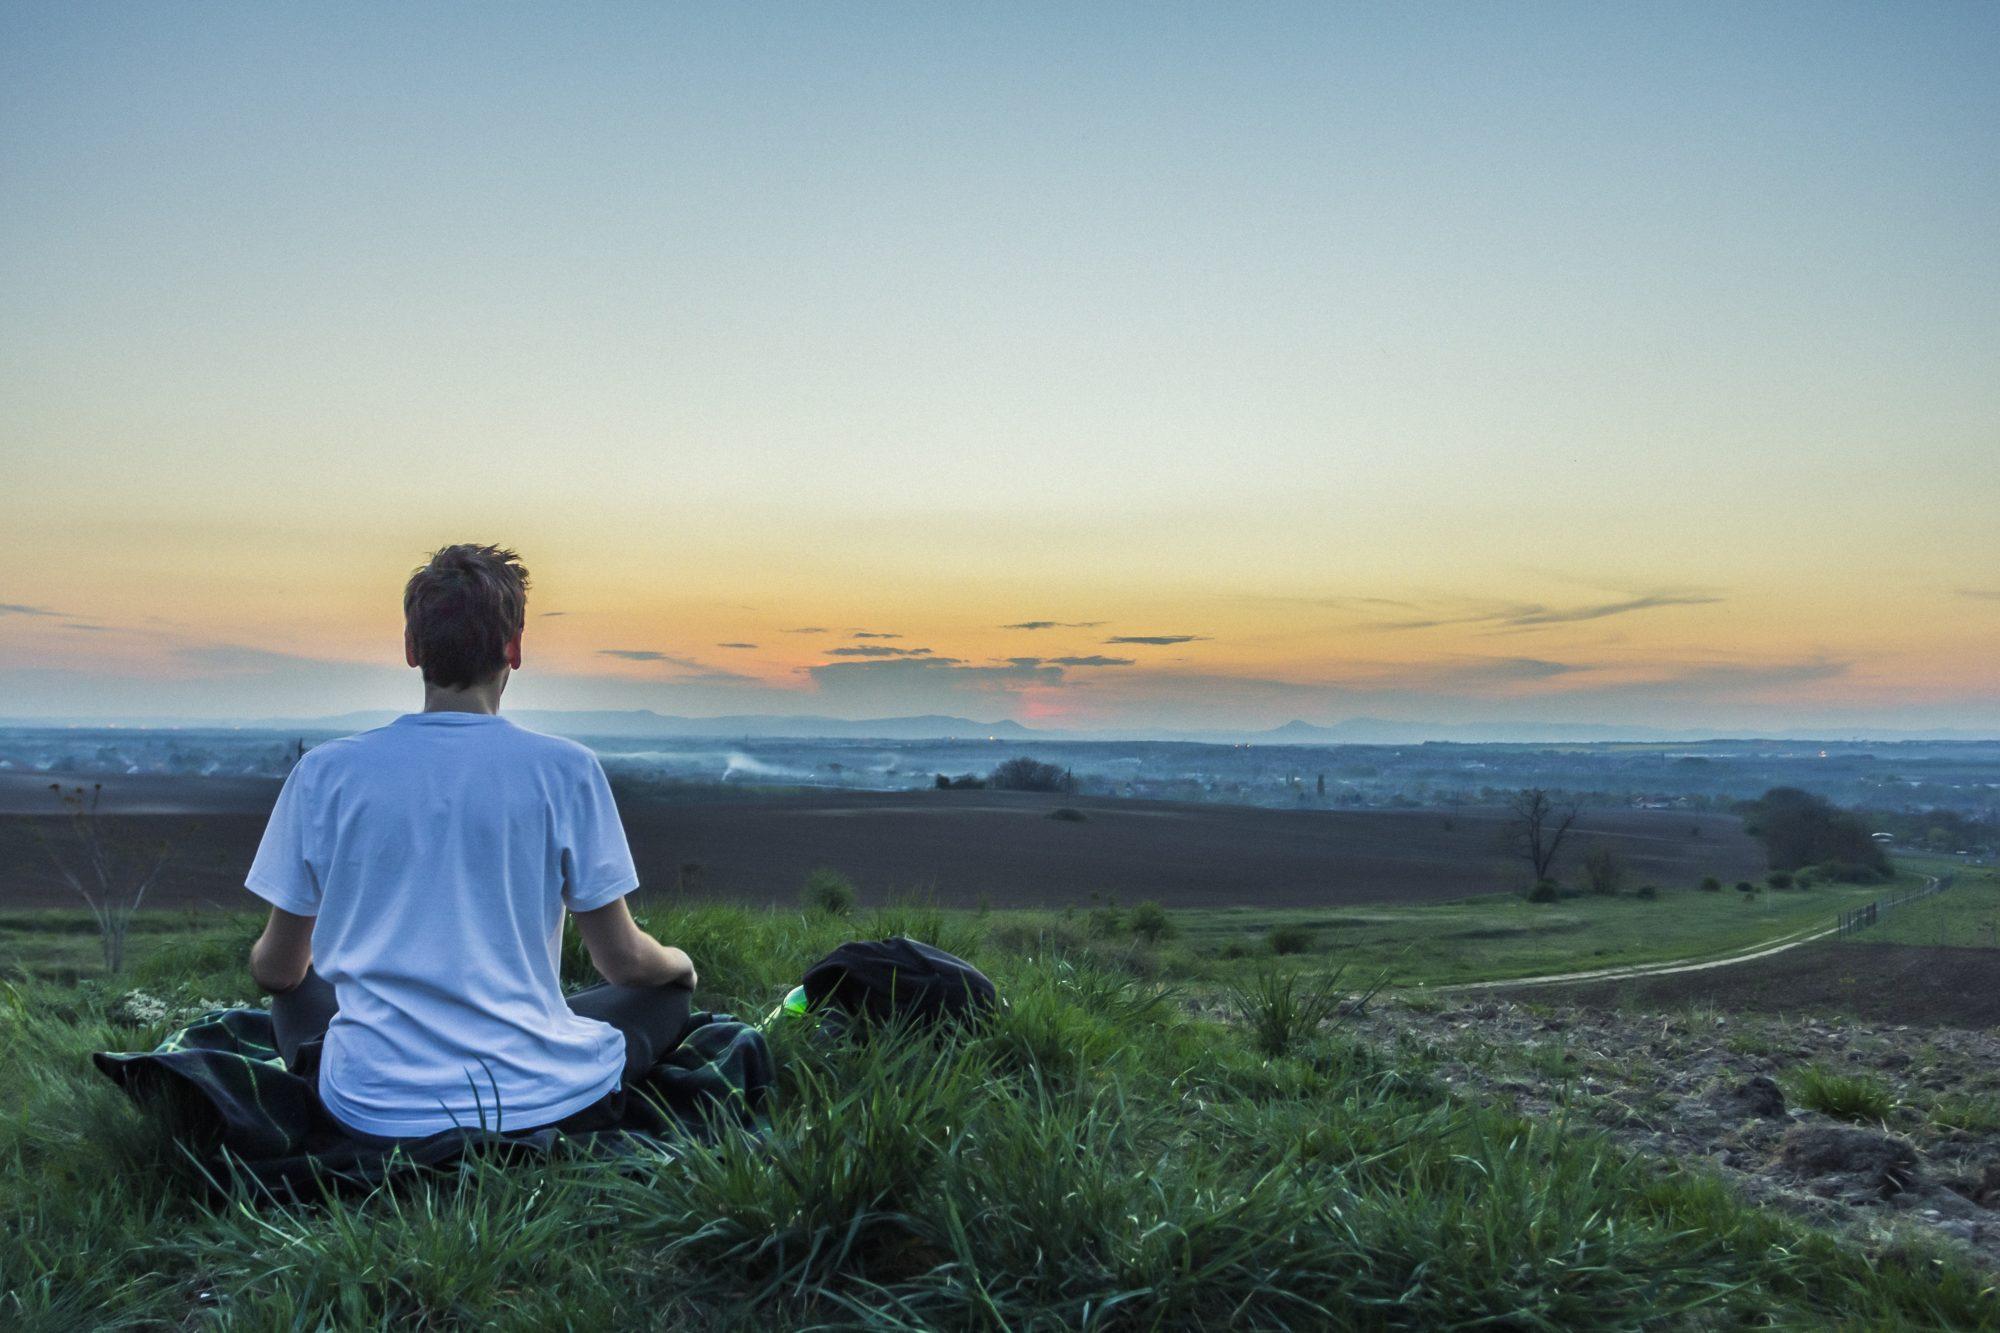 Warum Zen-Meditation?